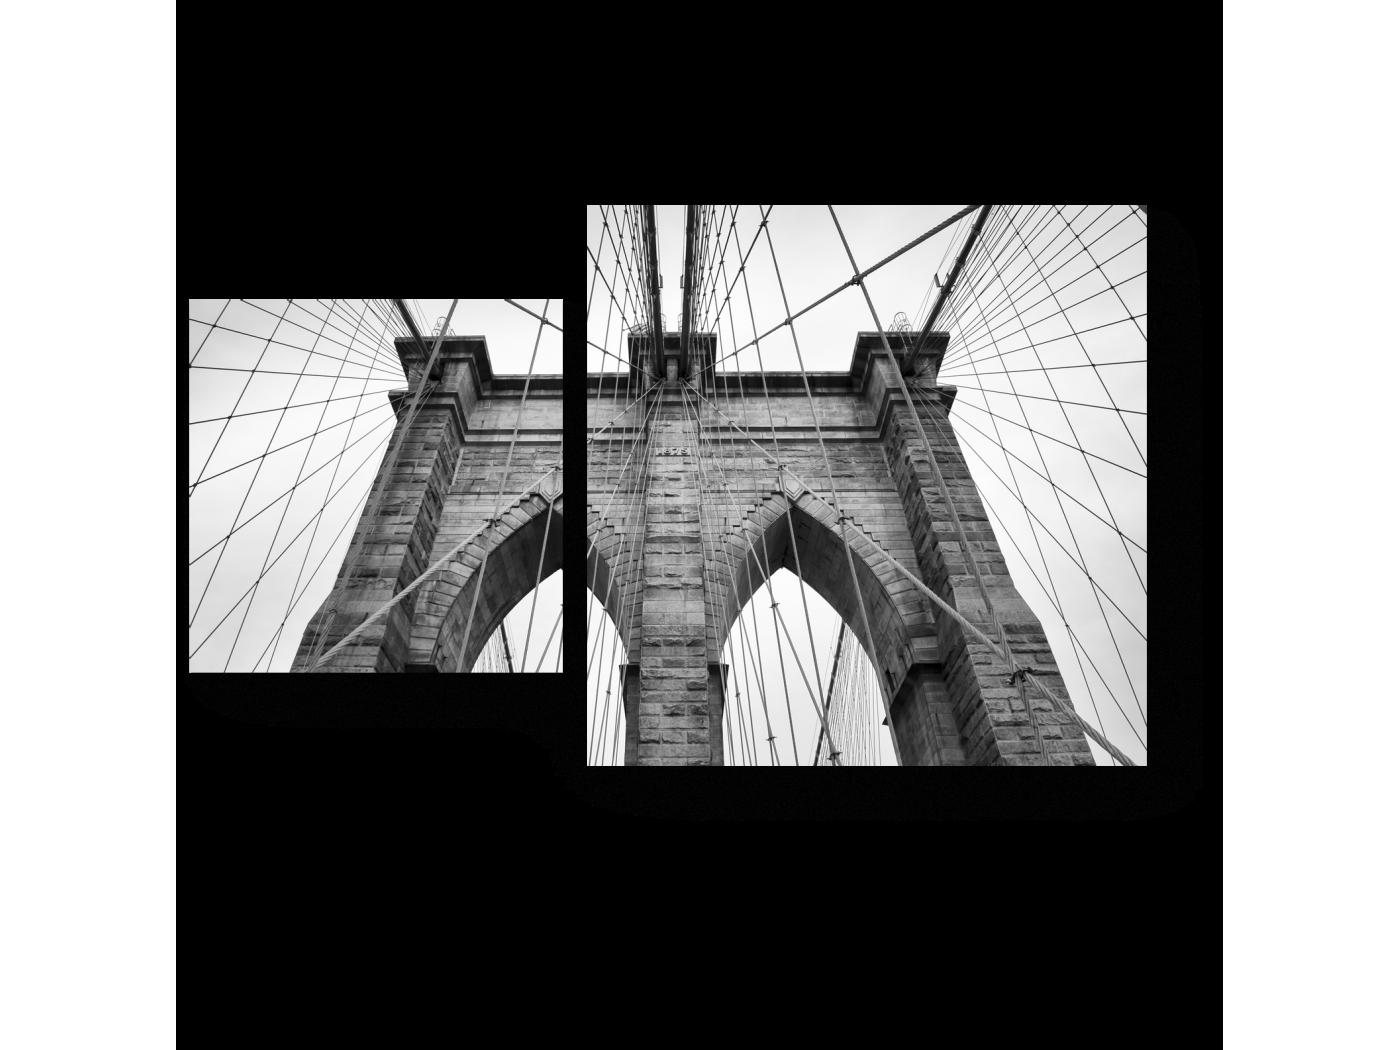 Модульная картина Строгость цвета, Бруклинский мост (50x30) фото